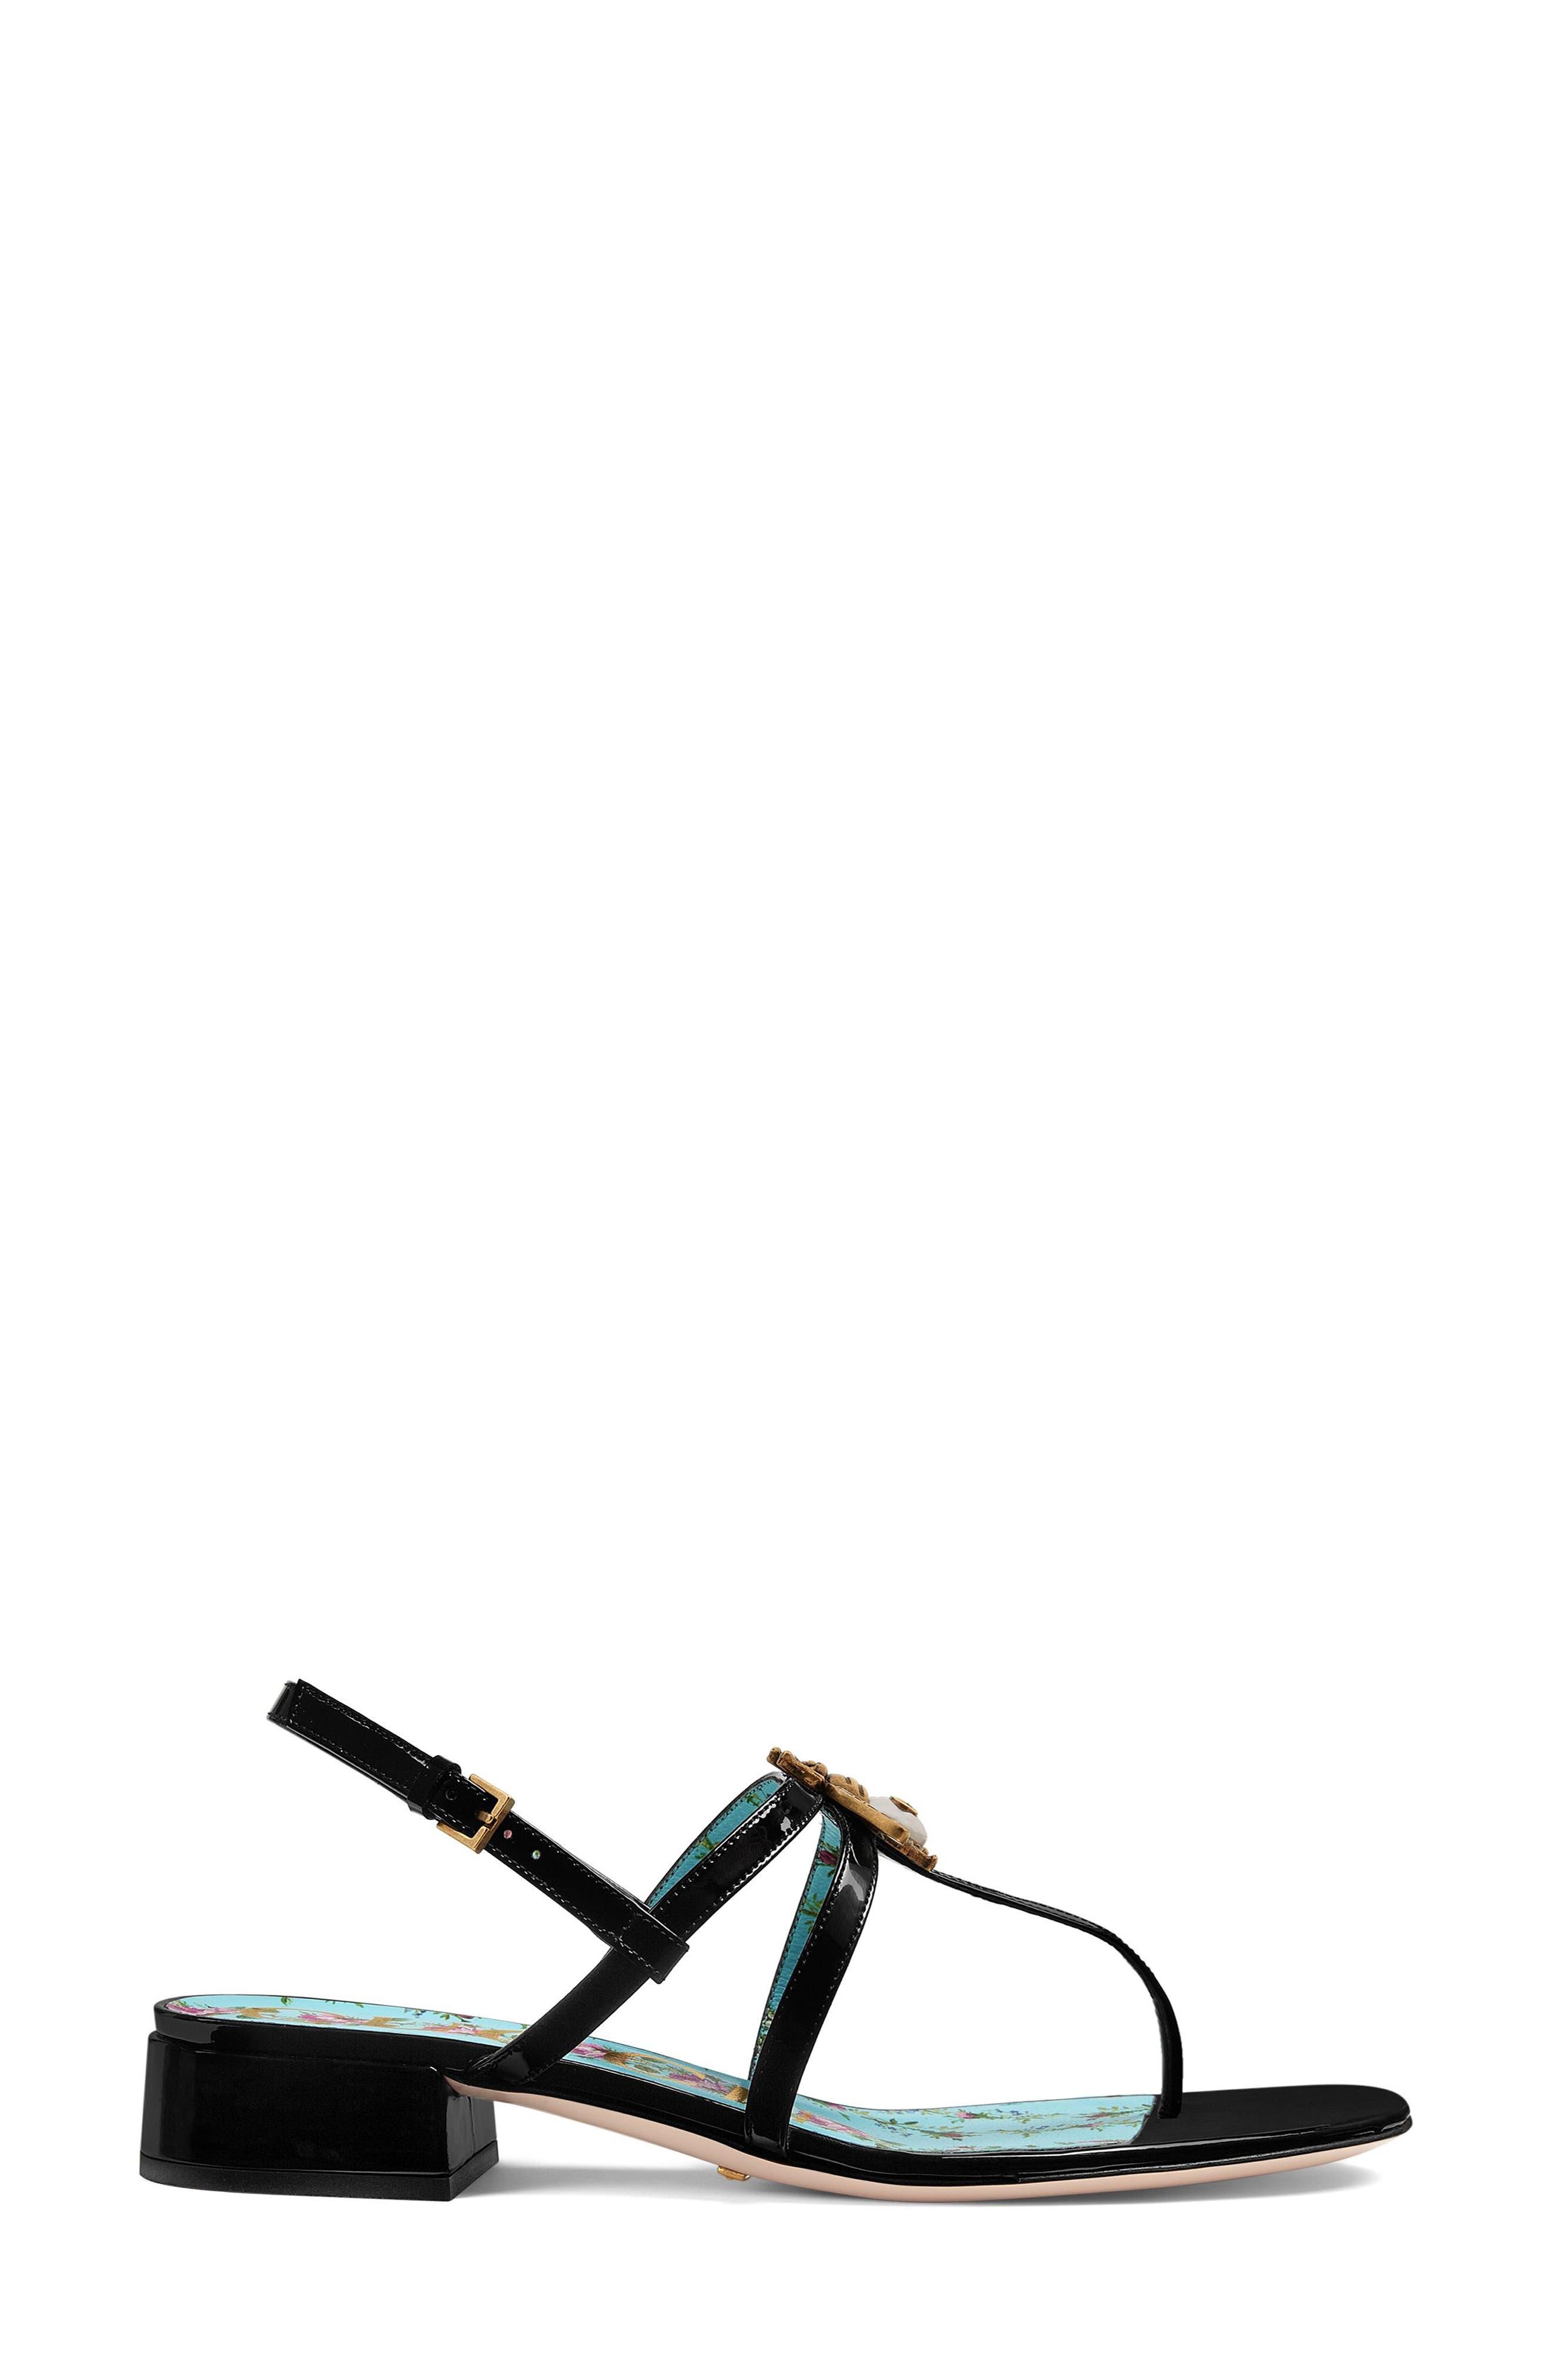 Bee Thong Sandal,                             Alternate thumbnail 2, color,                             Black